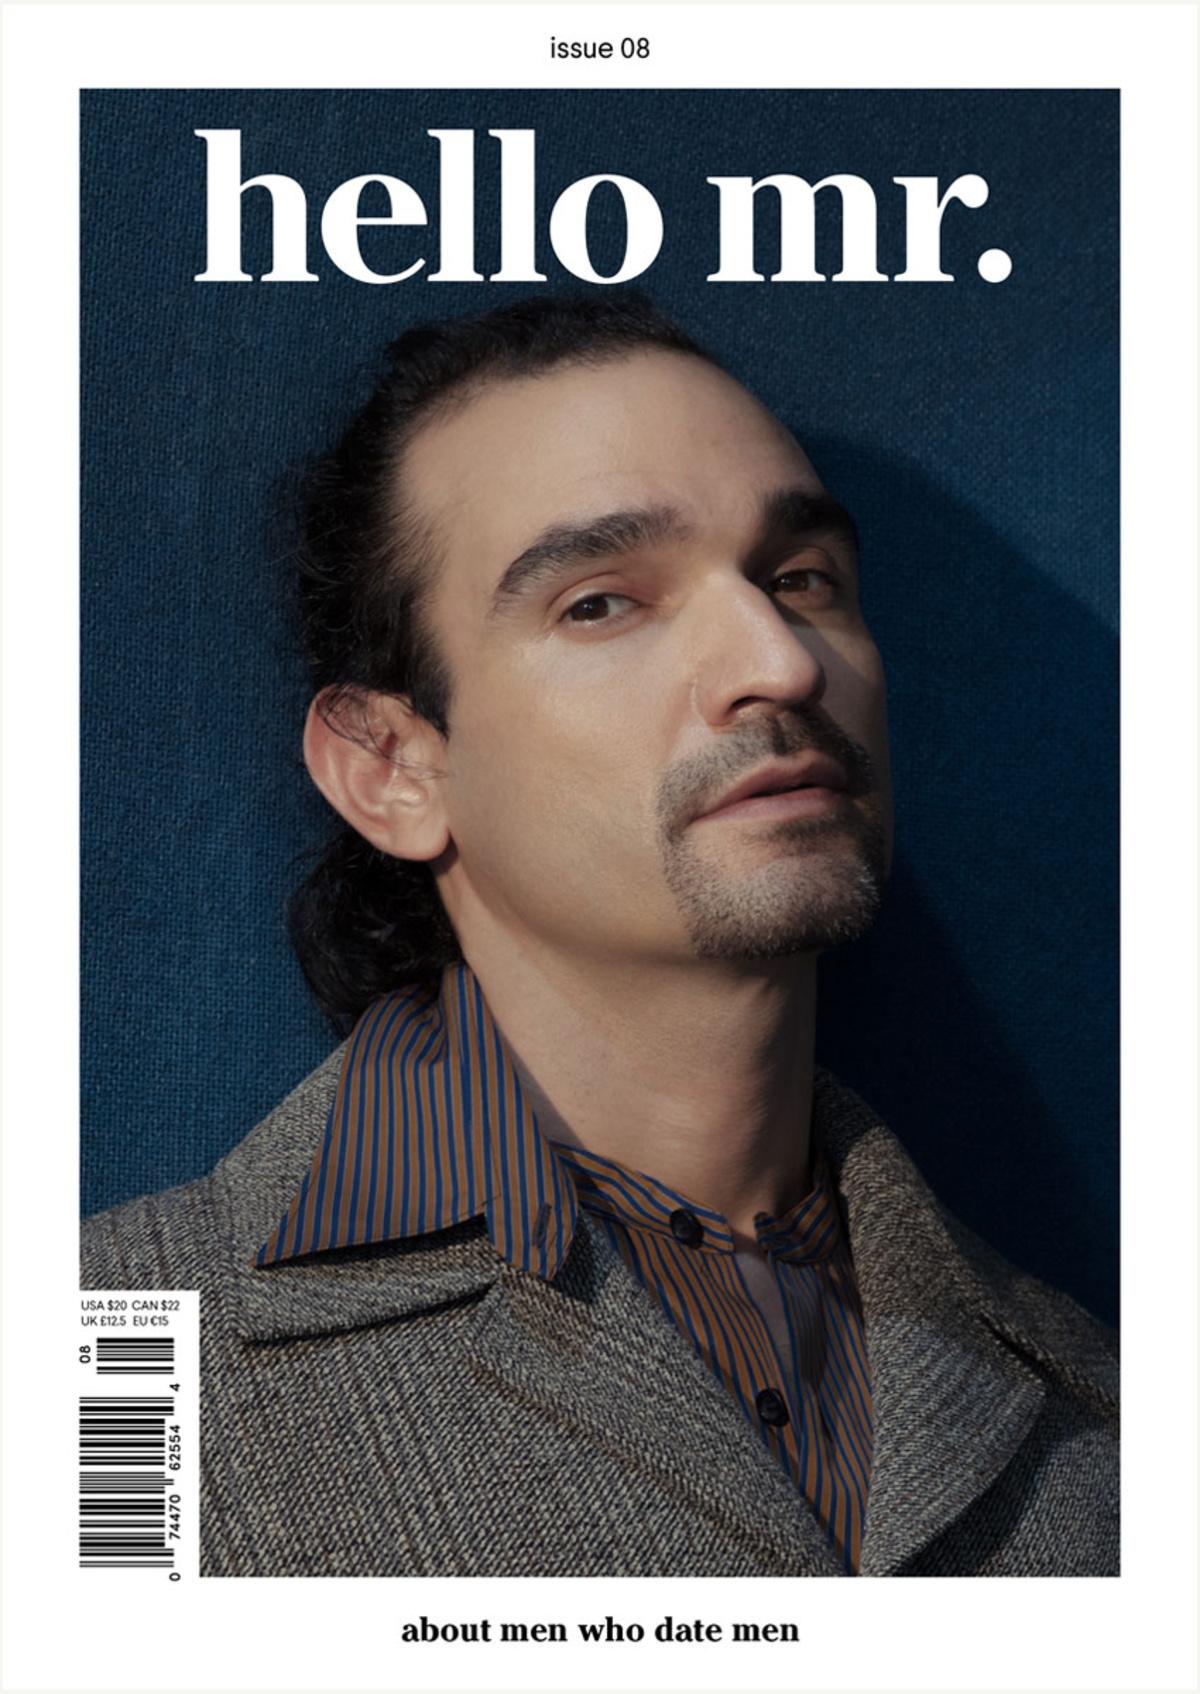 Issue 08 - Hello Mr.